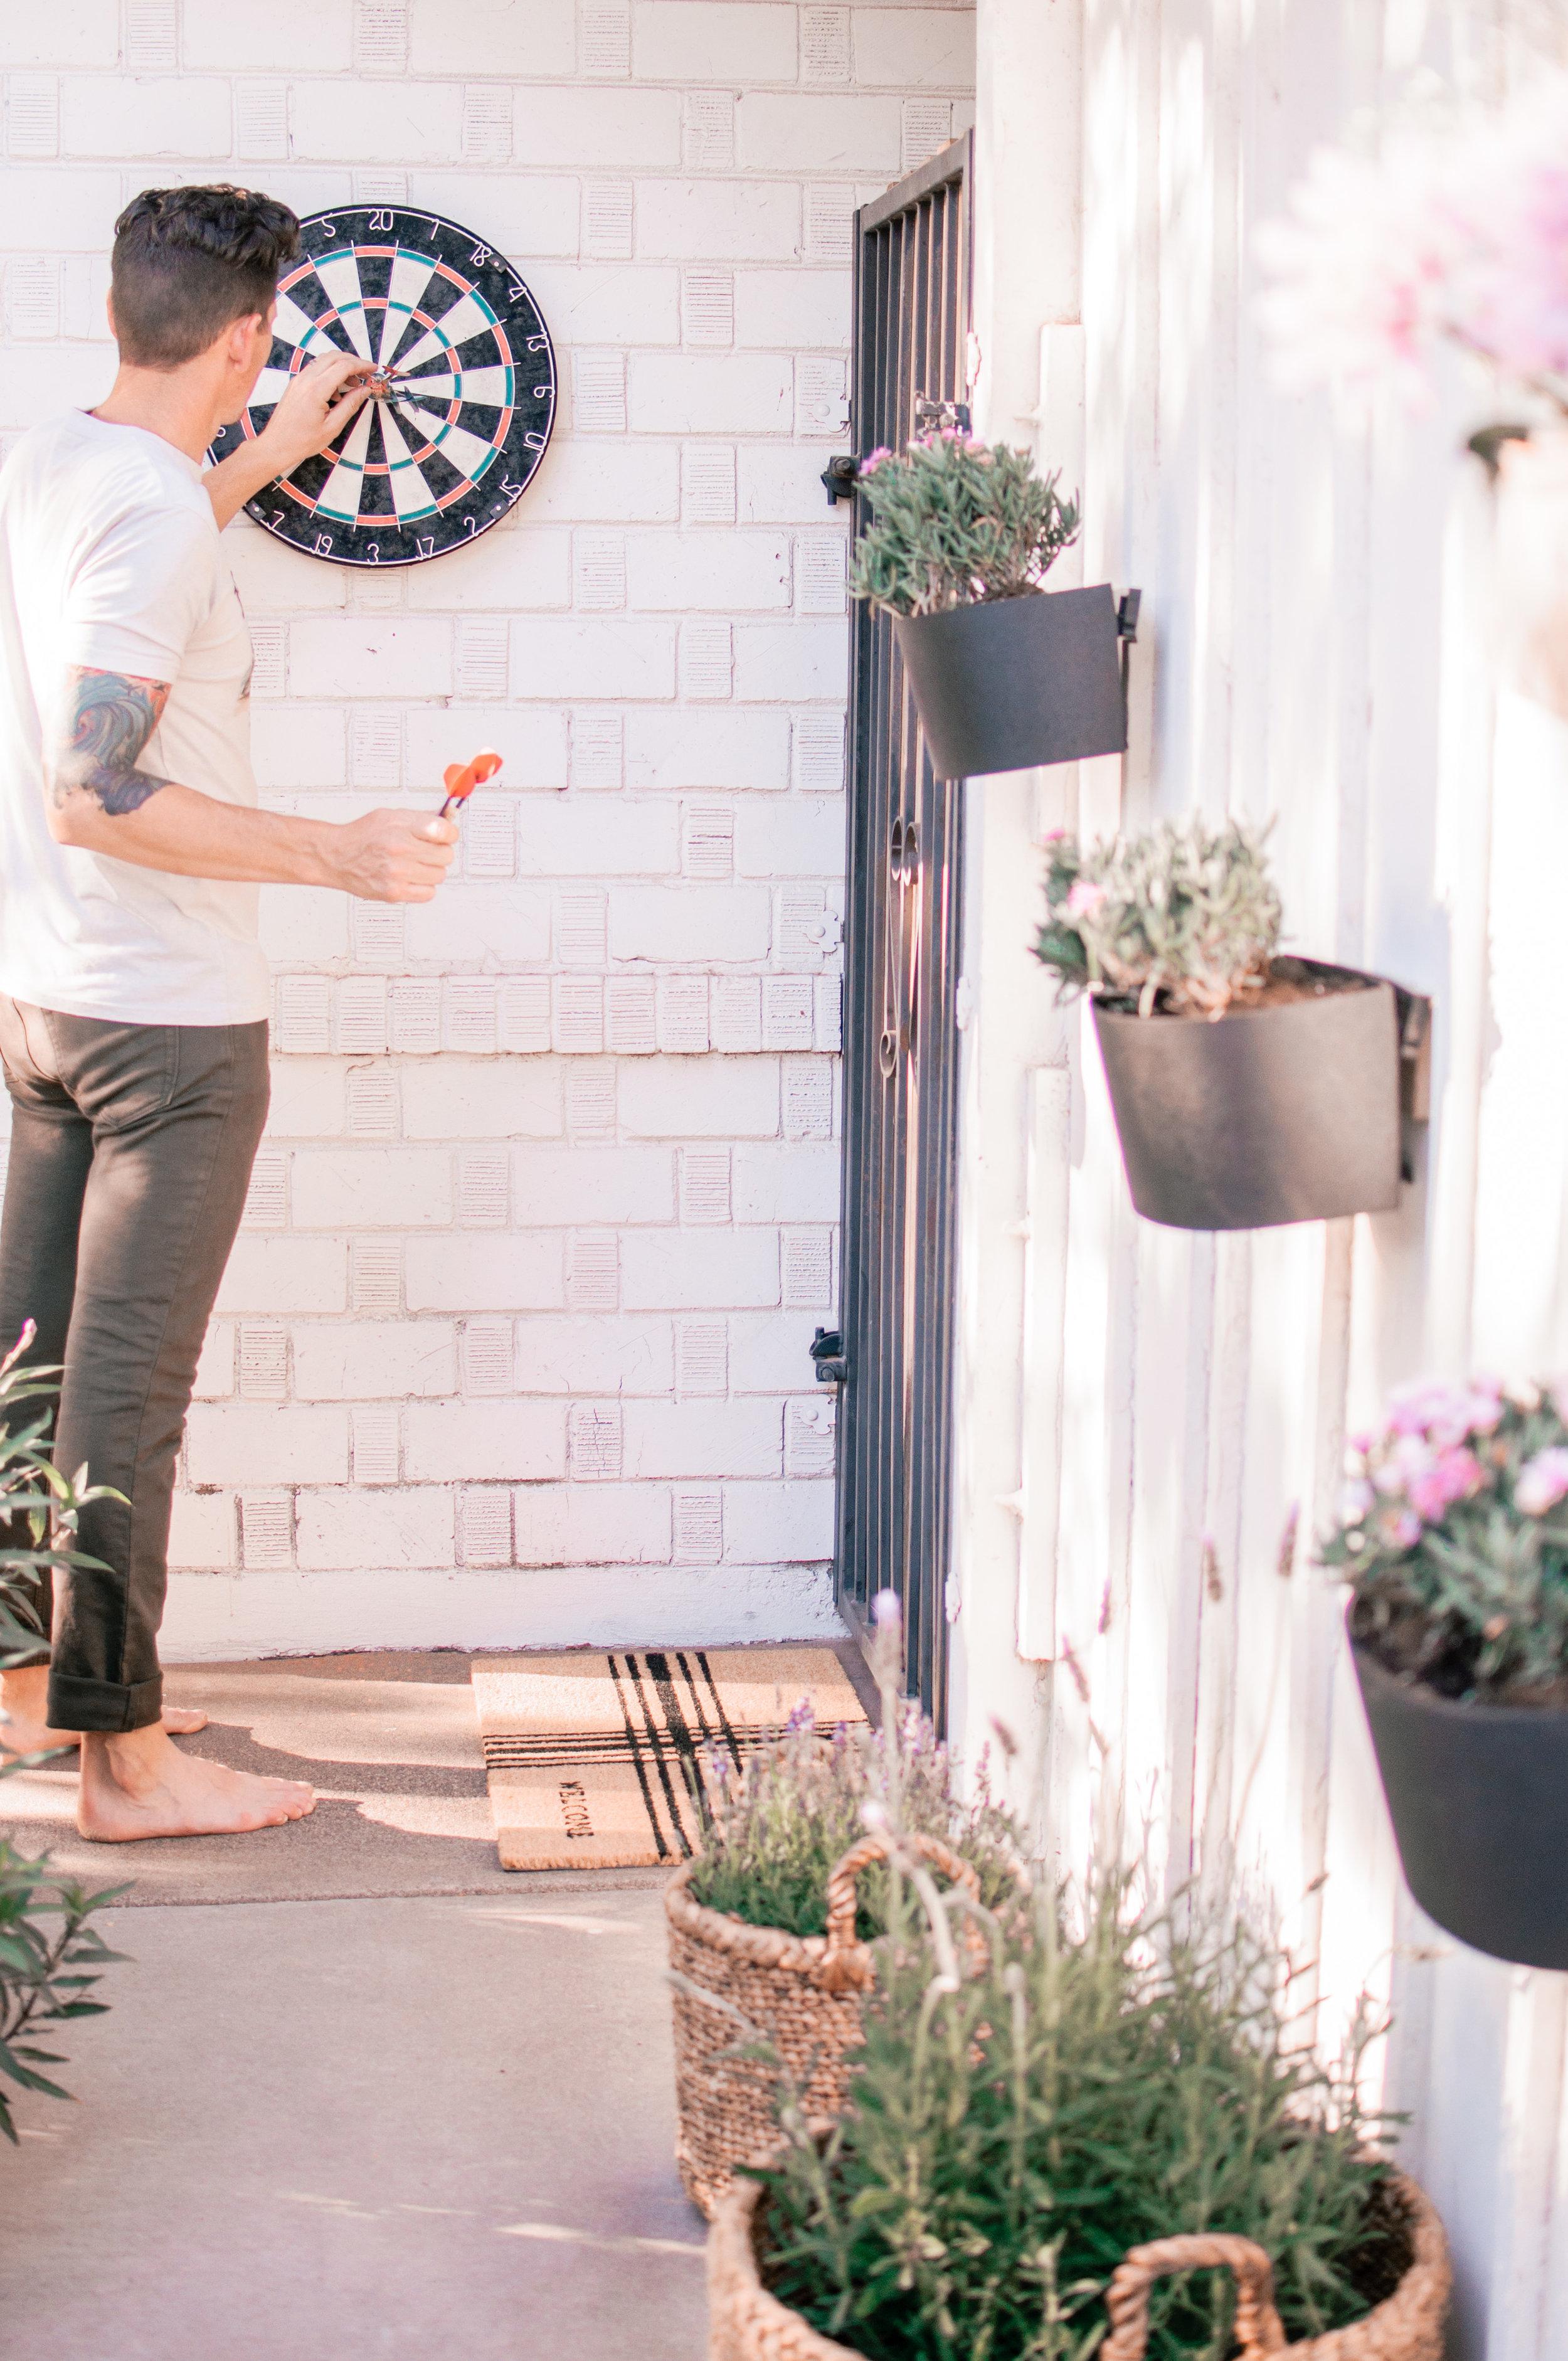 DIY Outdoor Backyard Patio Firepit Area Makeover